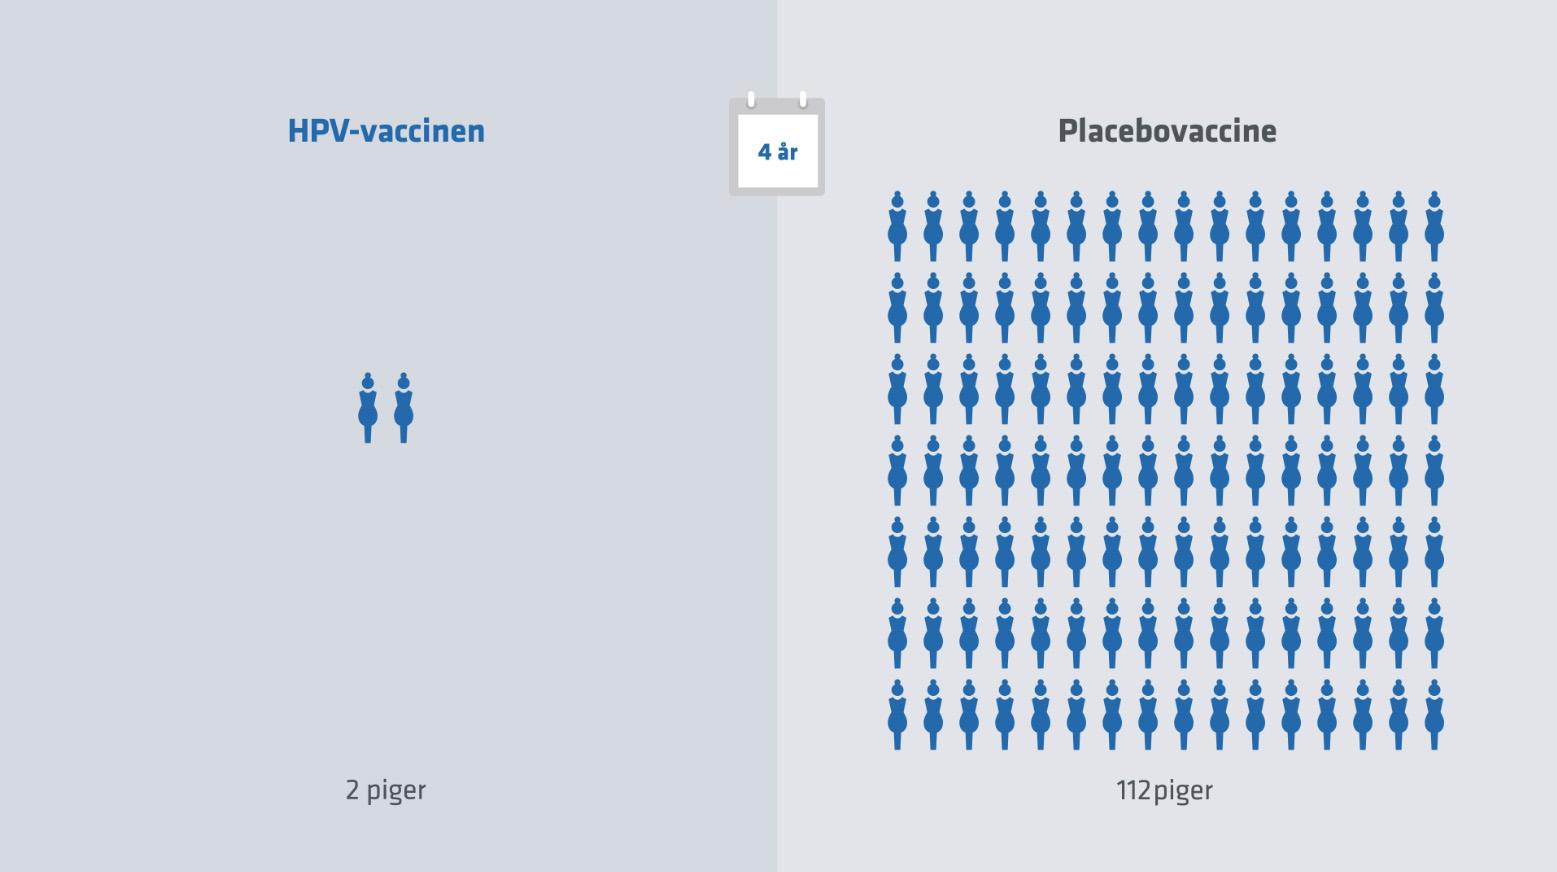 hpv vaccine bivirkninger 2020)